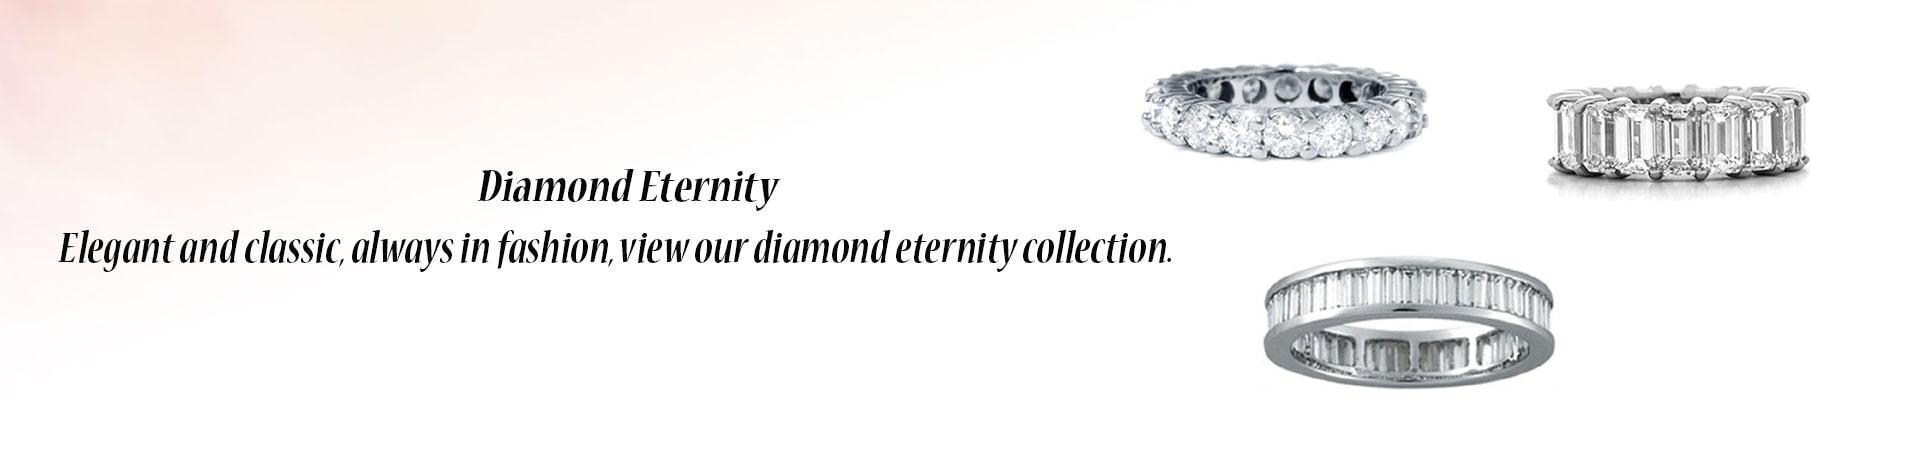 Diamond Eternity